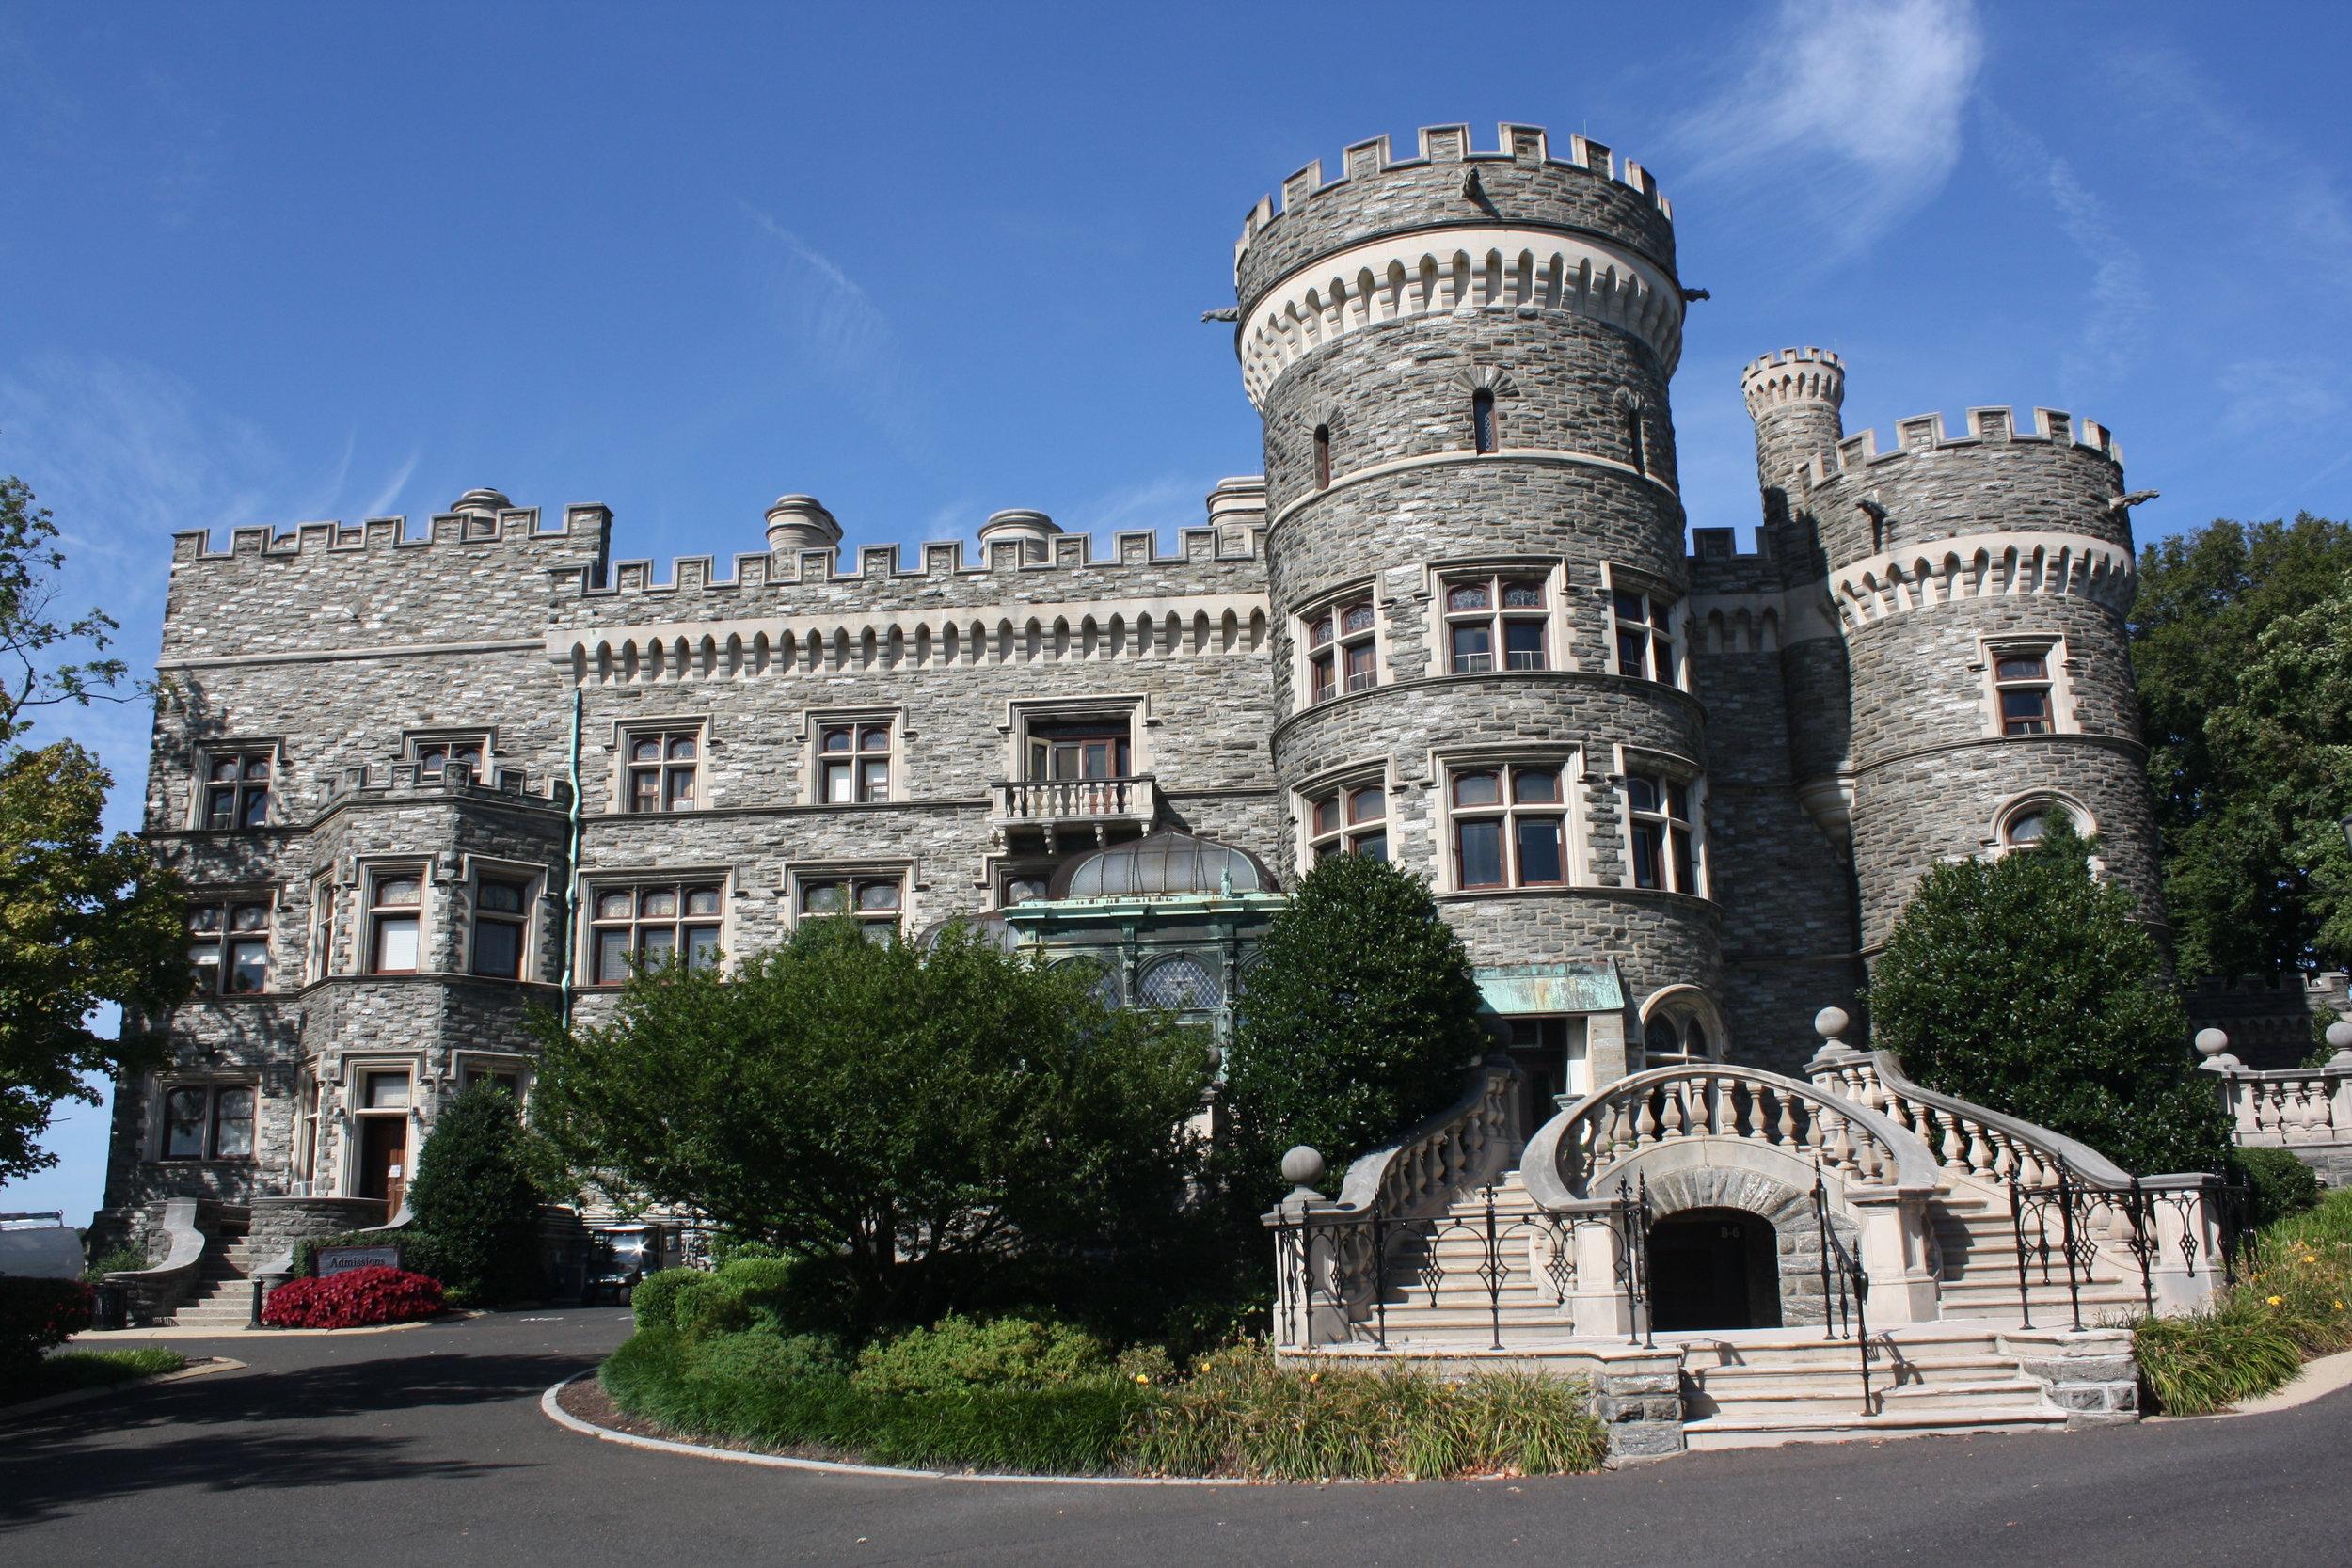 Grey_Towers_Castle,_Southern_Side_01.JPG